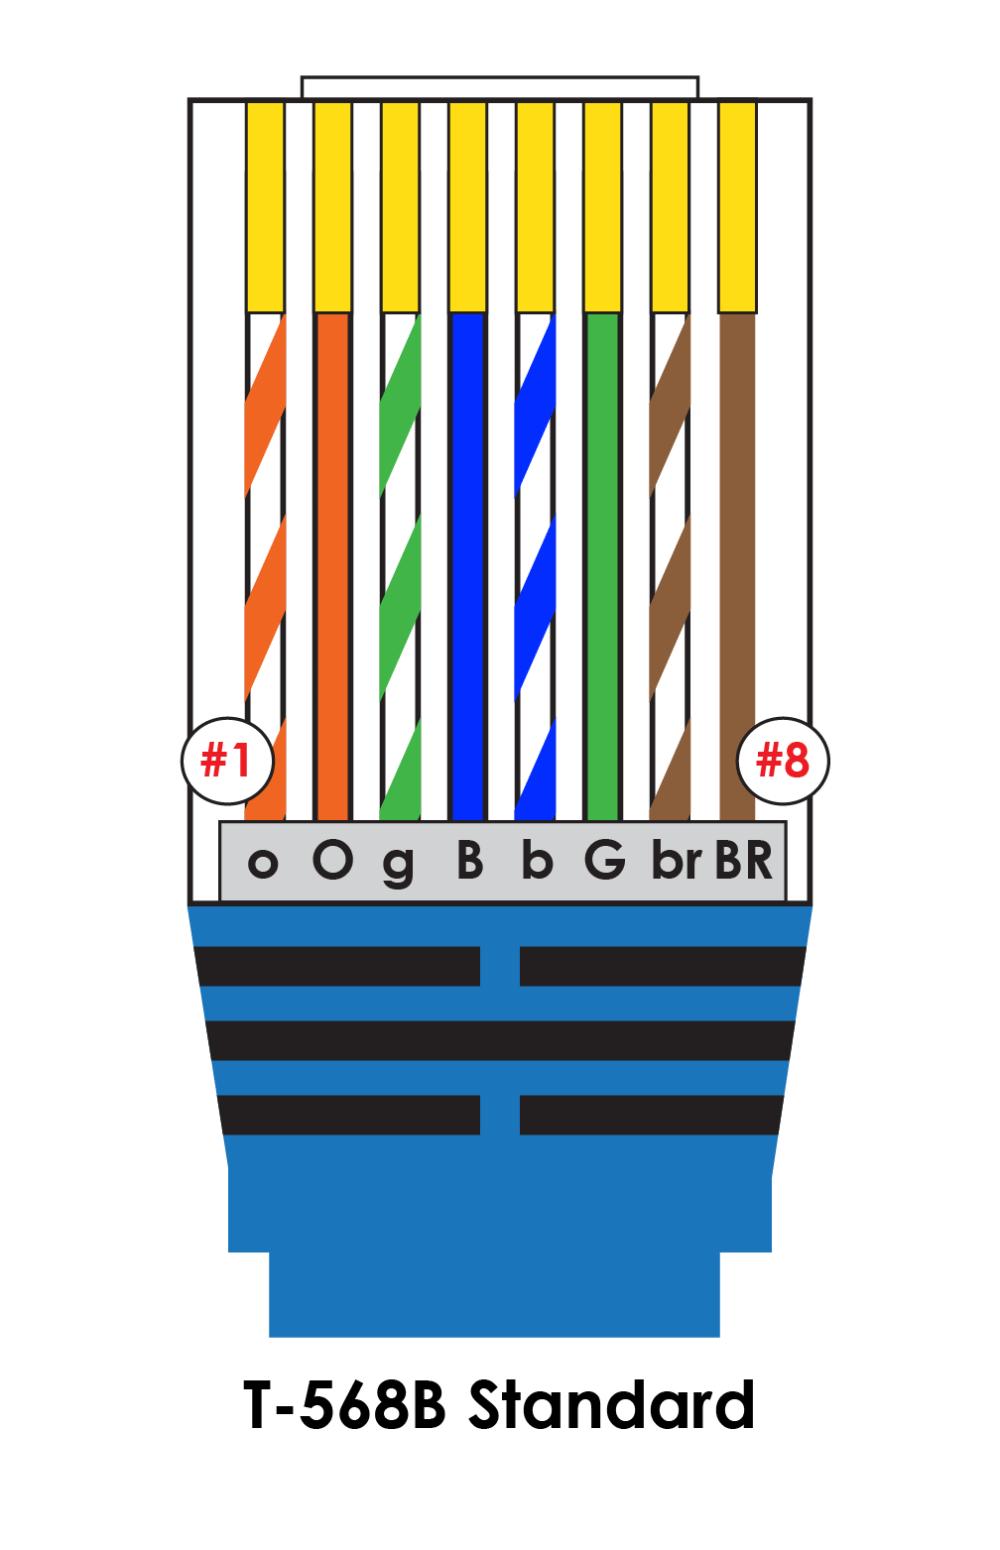 medium resolution of iec t568b pin out